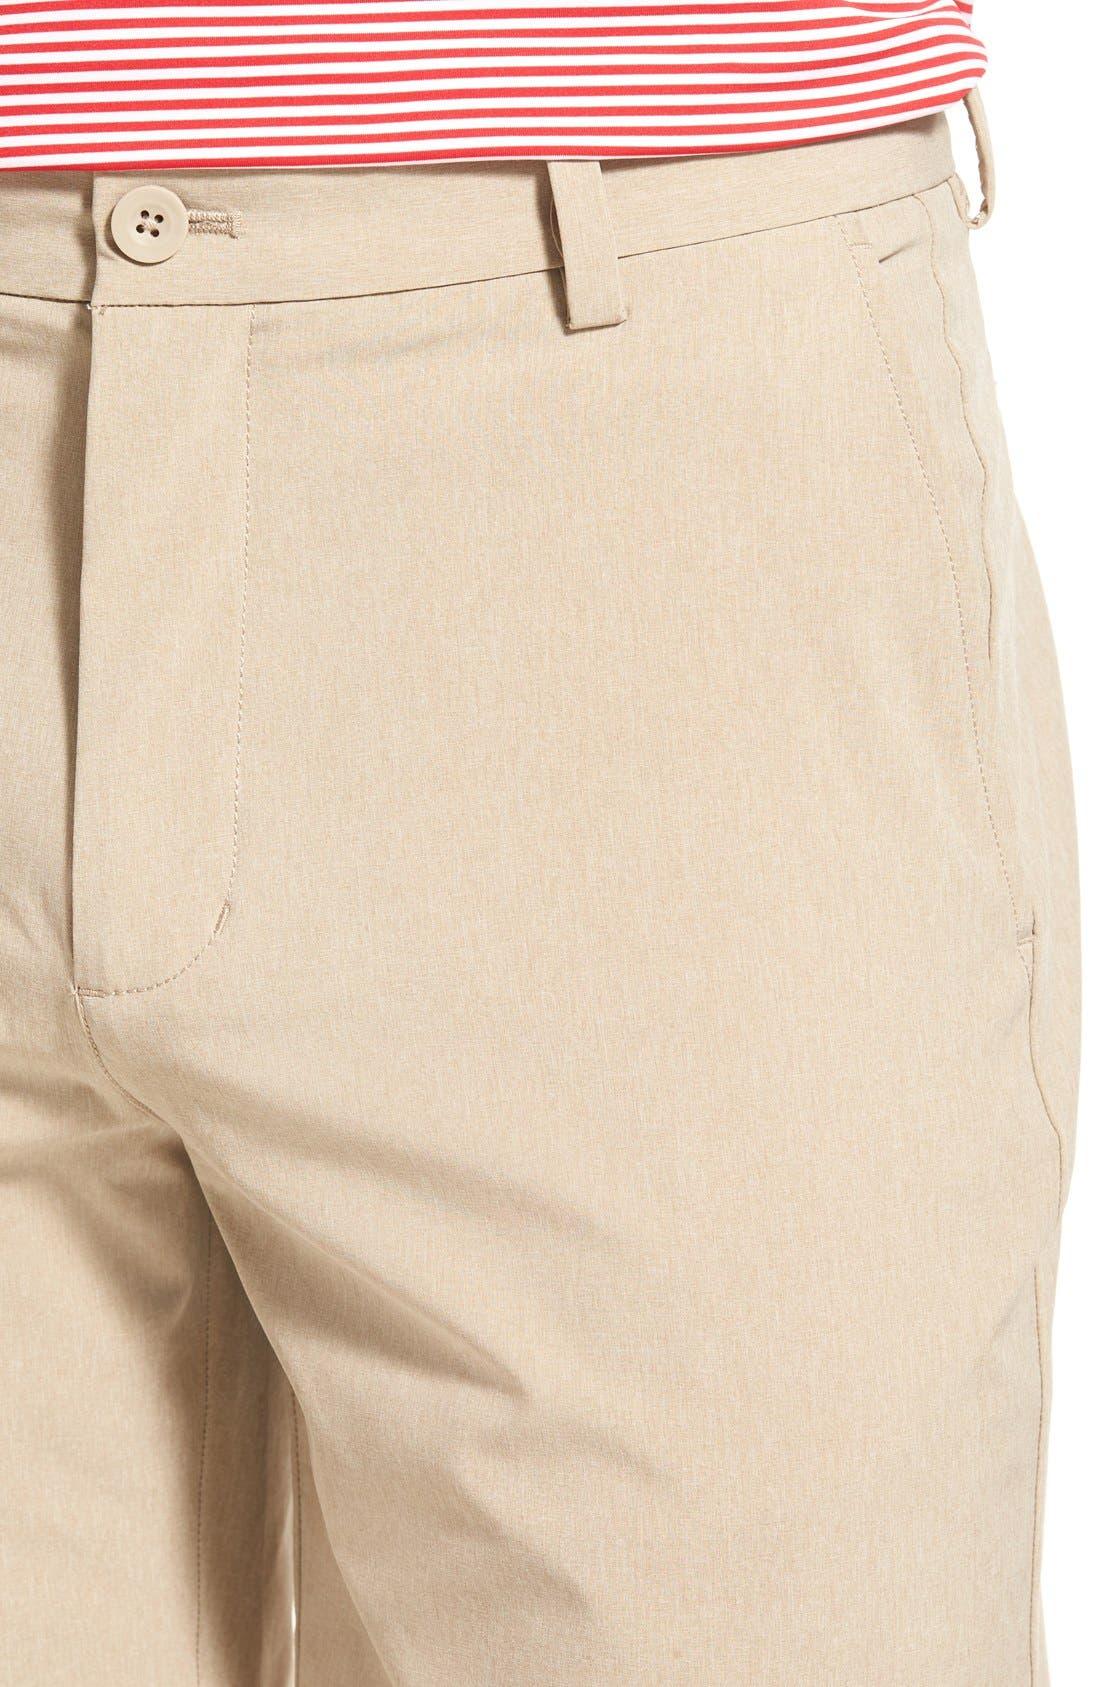 8 Inch Performance Breaker Shorts,                             Alternate thumbnail 62, color,